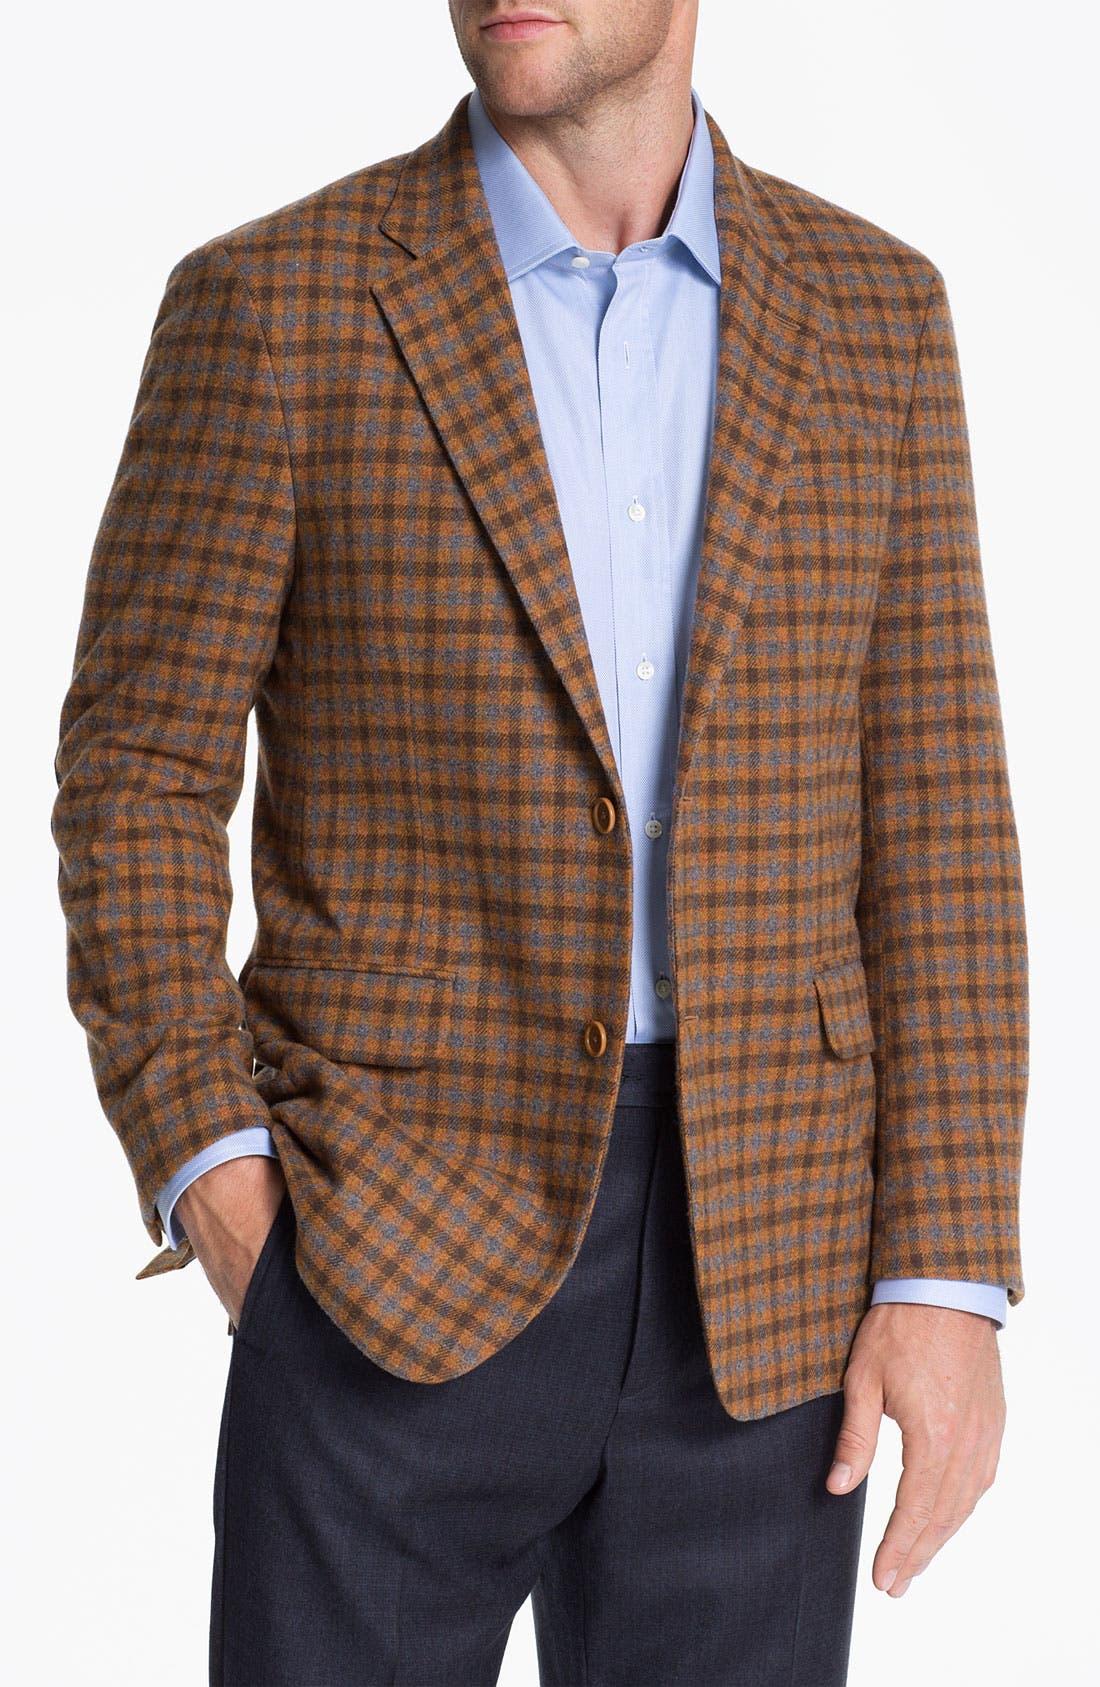 Alternate Image 1 Selected - Robert Talbott Check Wool Sportcoat